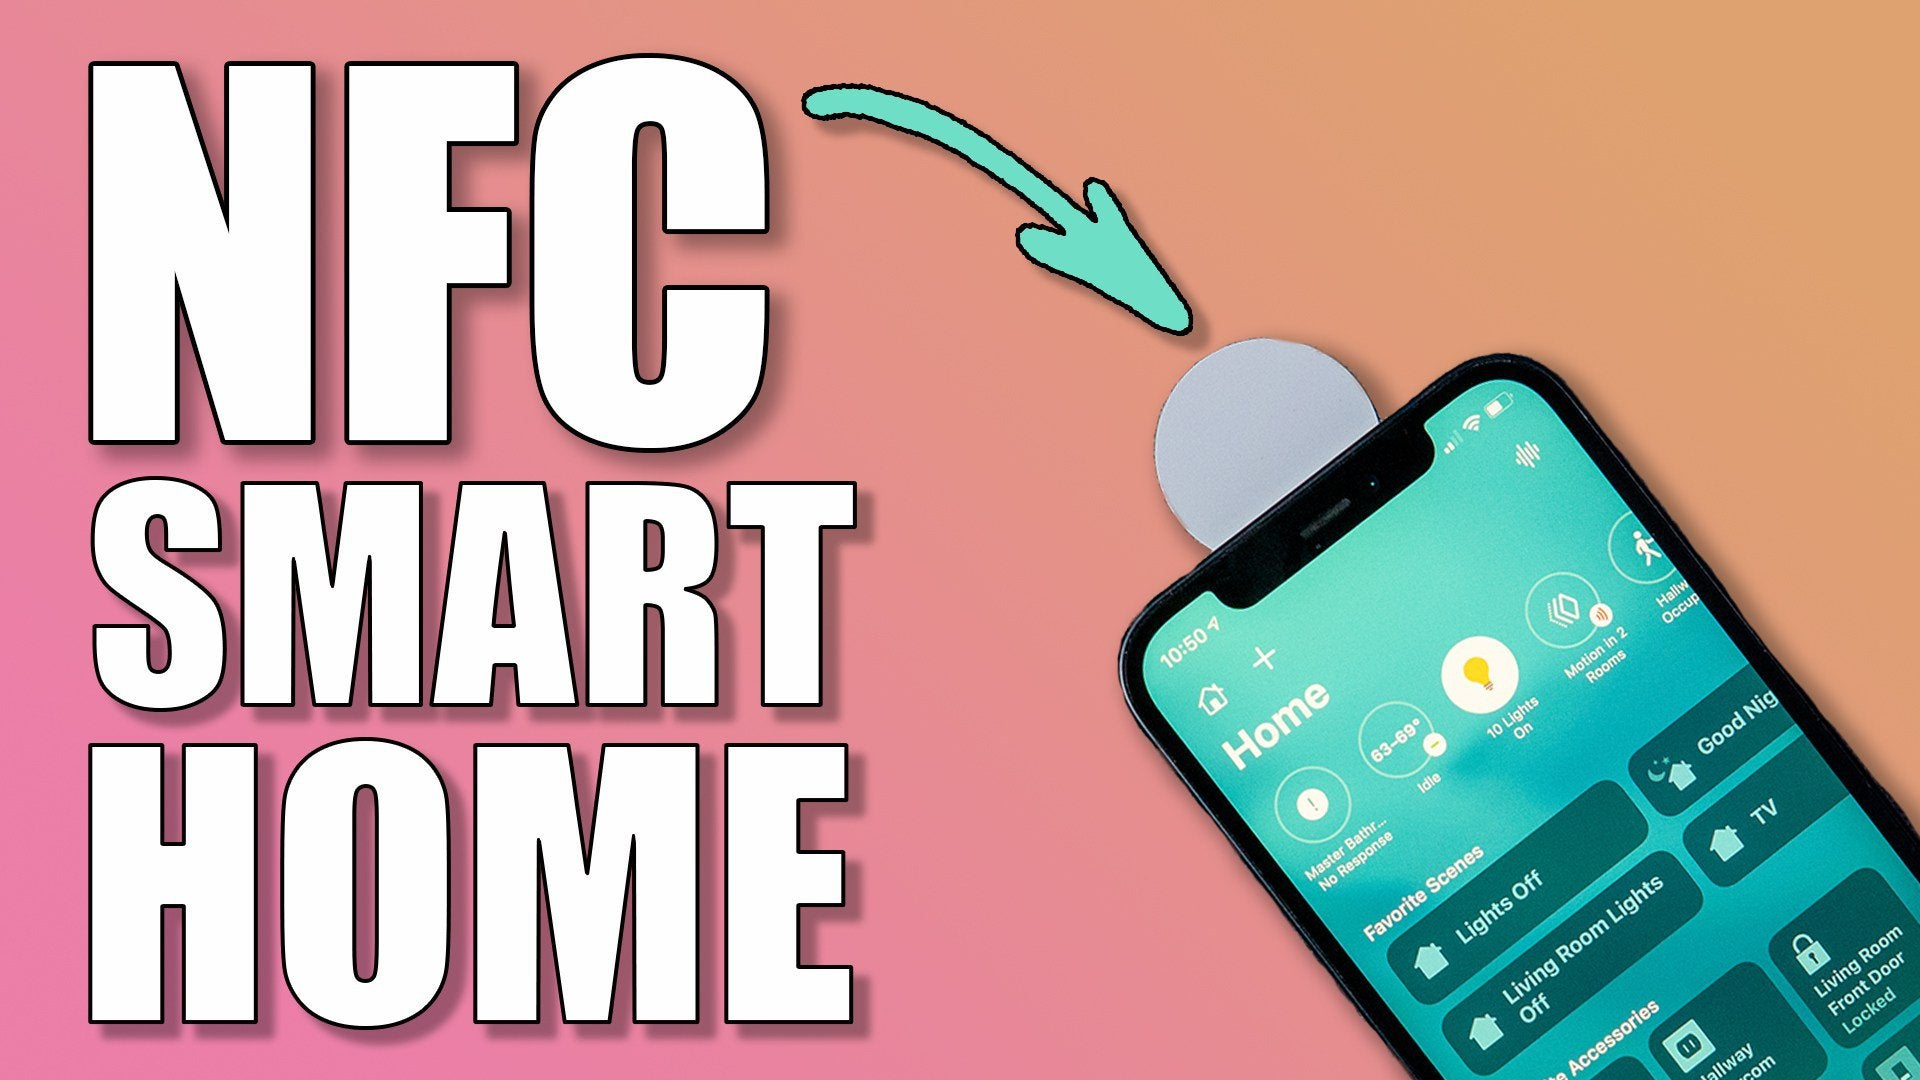 NFC tag shortcut ideas